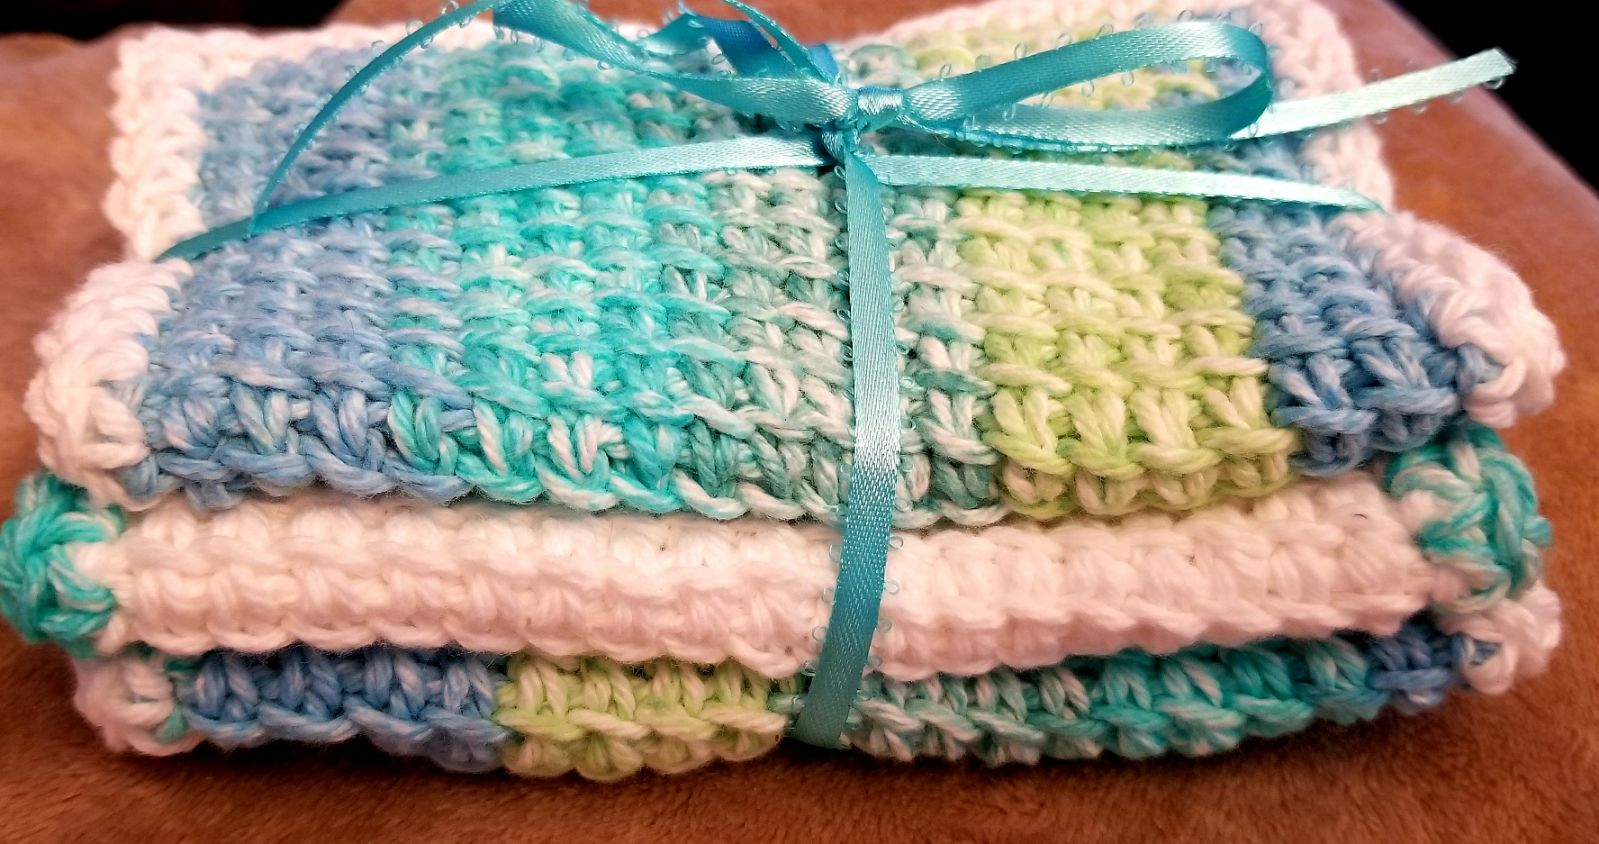 Set of 3 Mermaid colored spa cloths